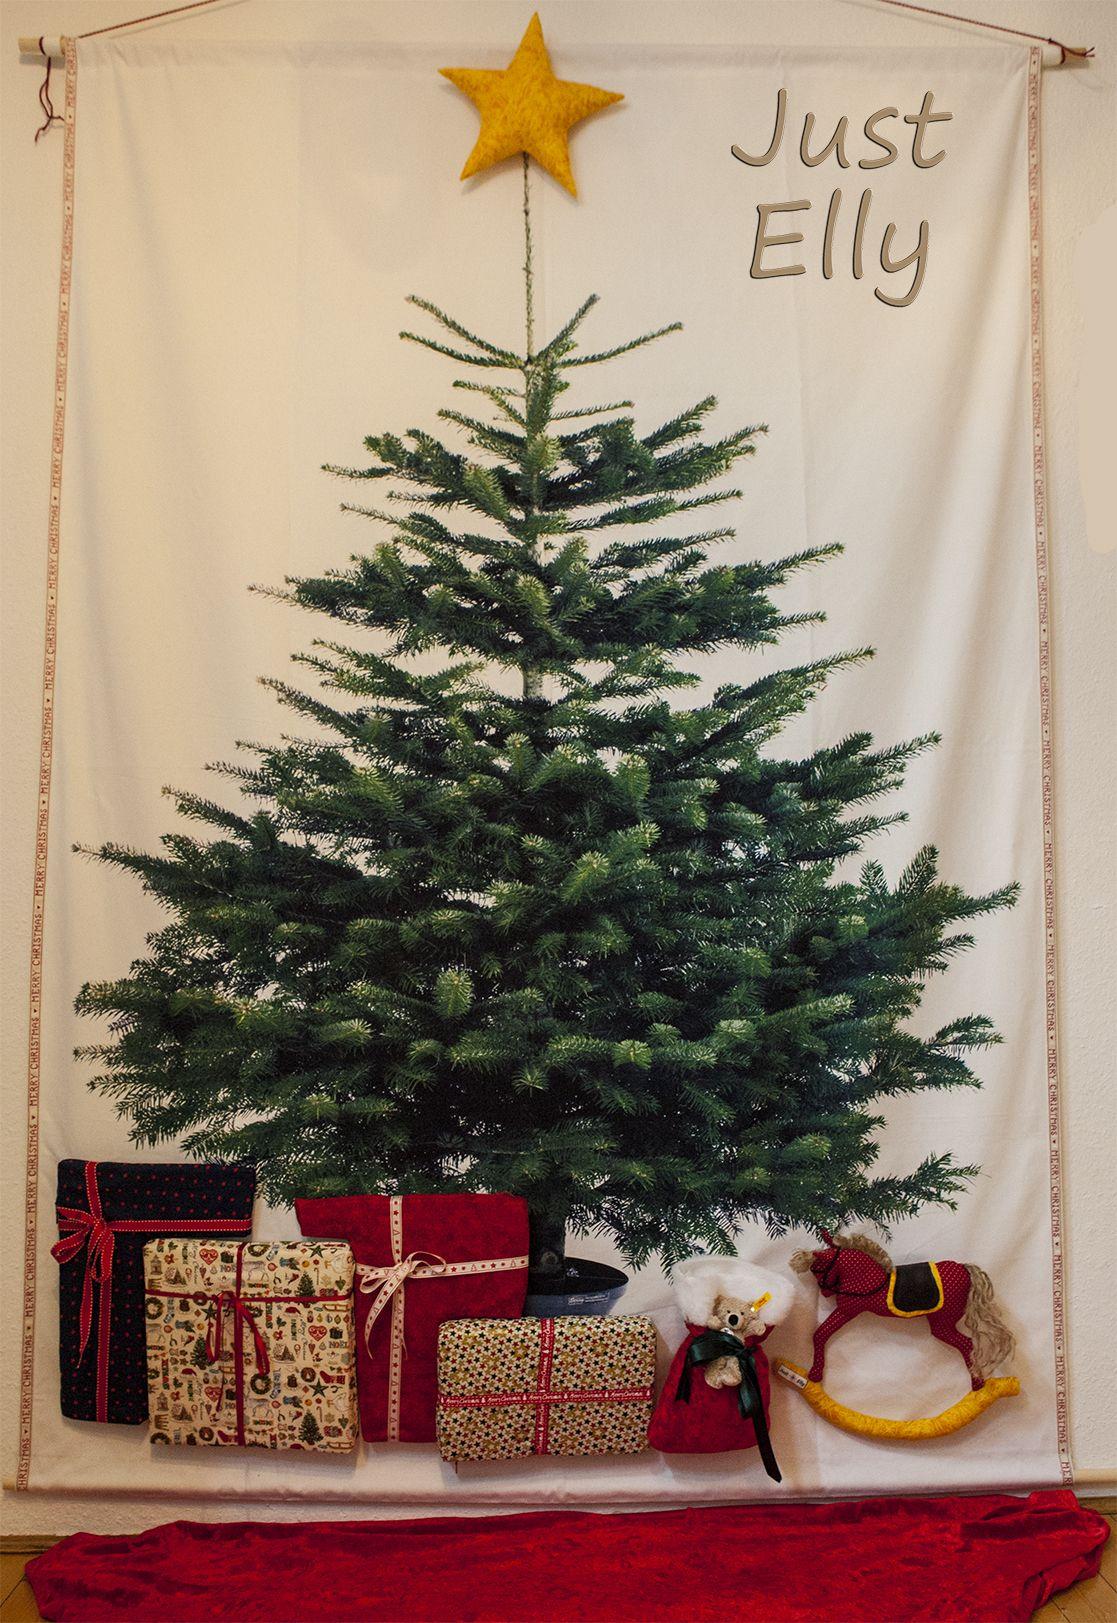 Justellydotcom Ikea Christmas Tree Ikea Christmas Christmas Projects Diy